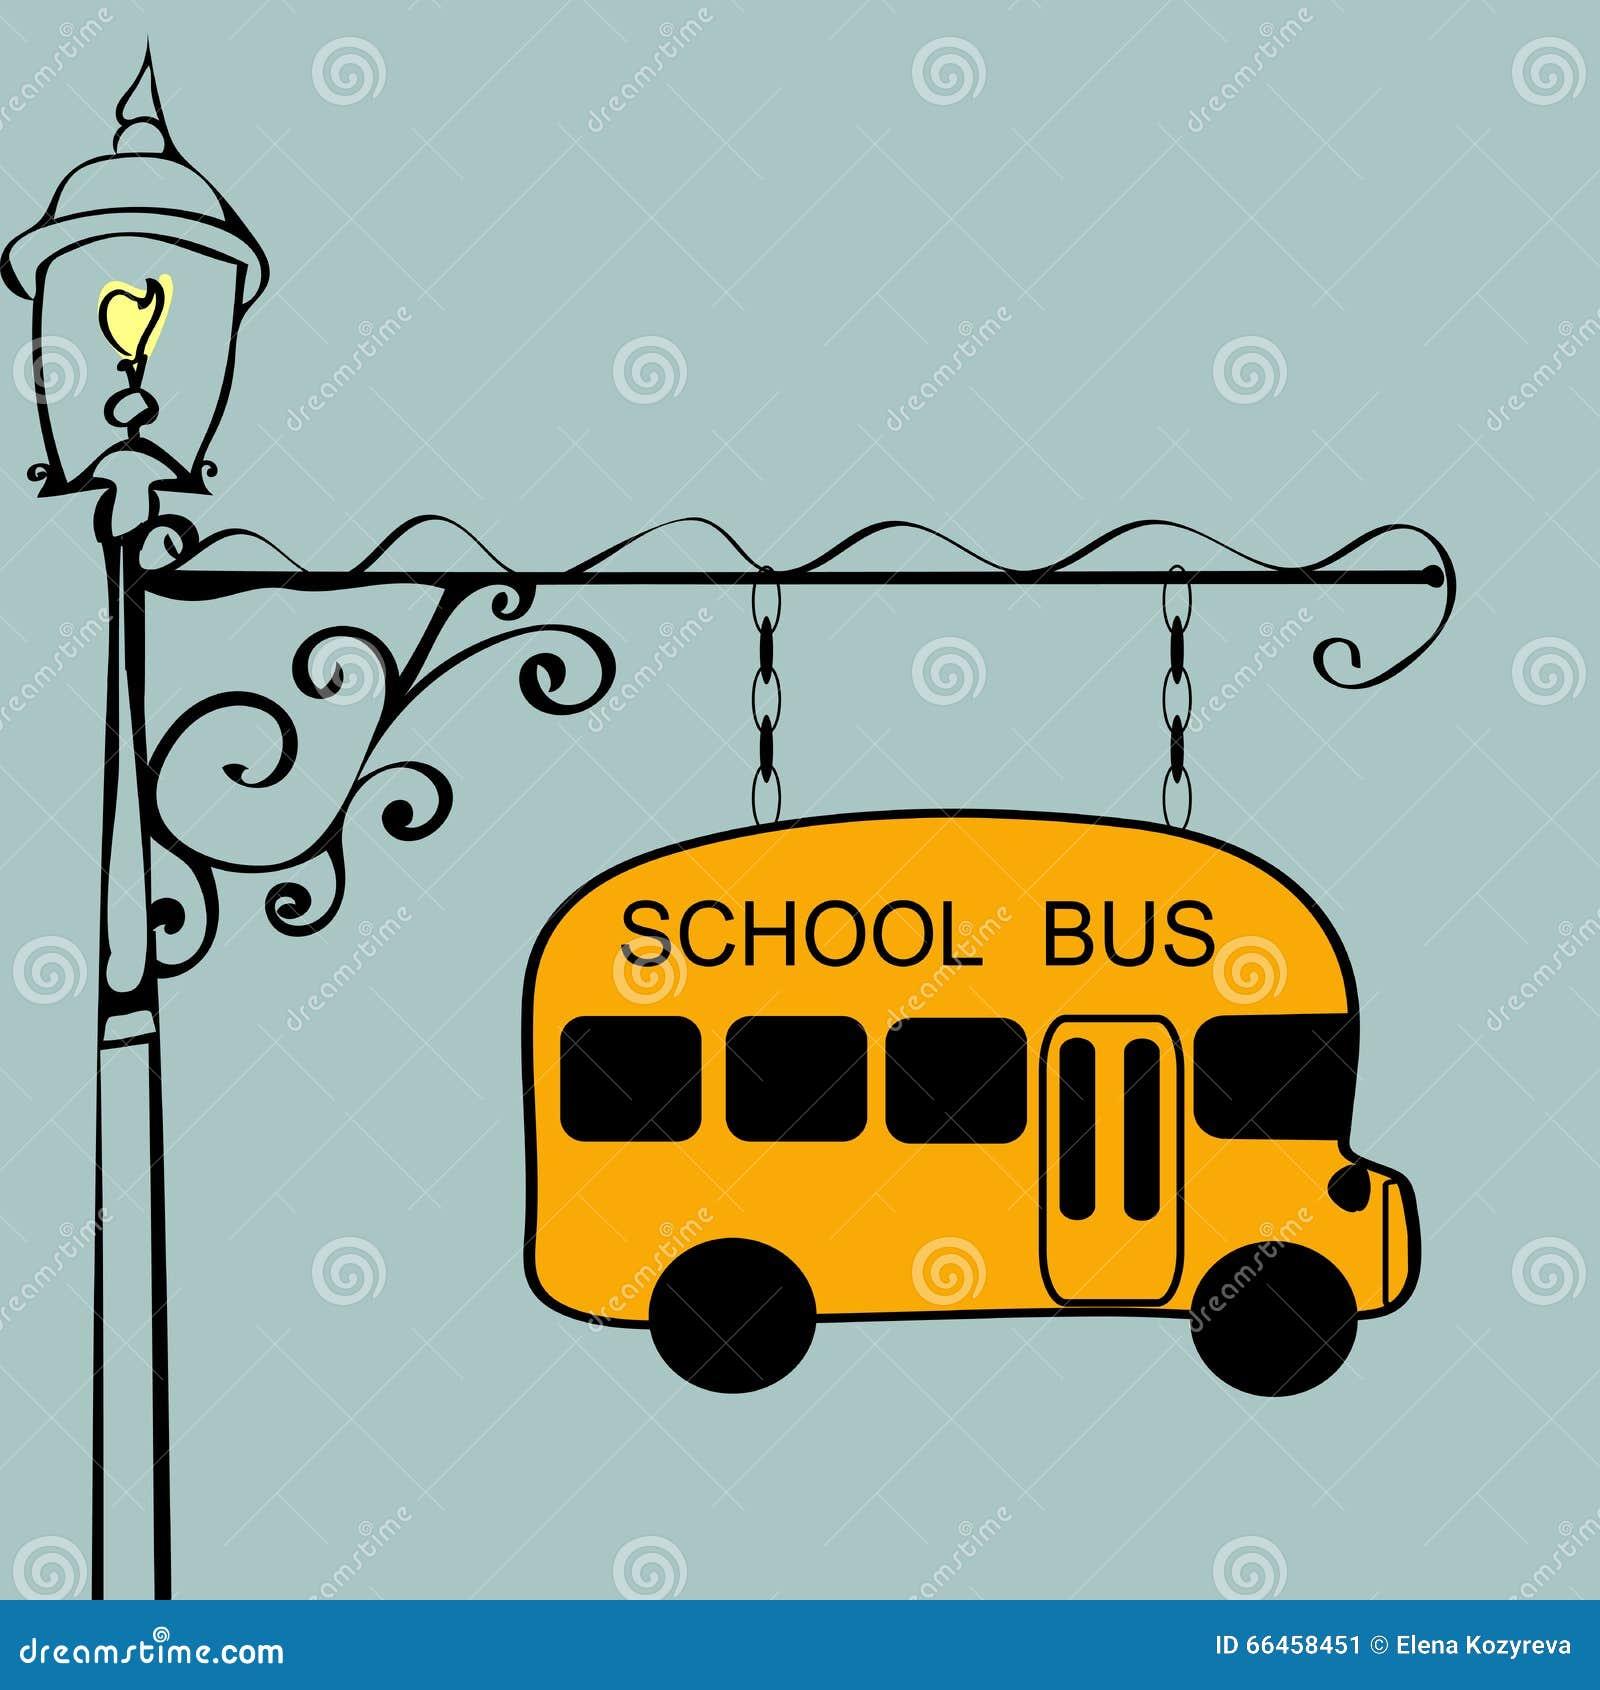 Vintage Sign School Bus Stop Stock Vector - Image: 66458451